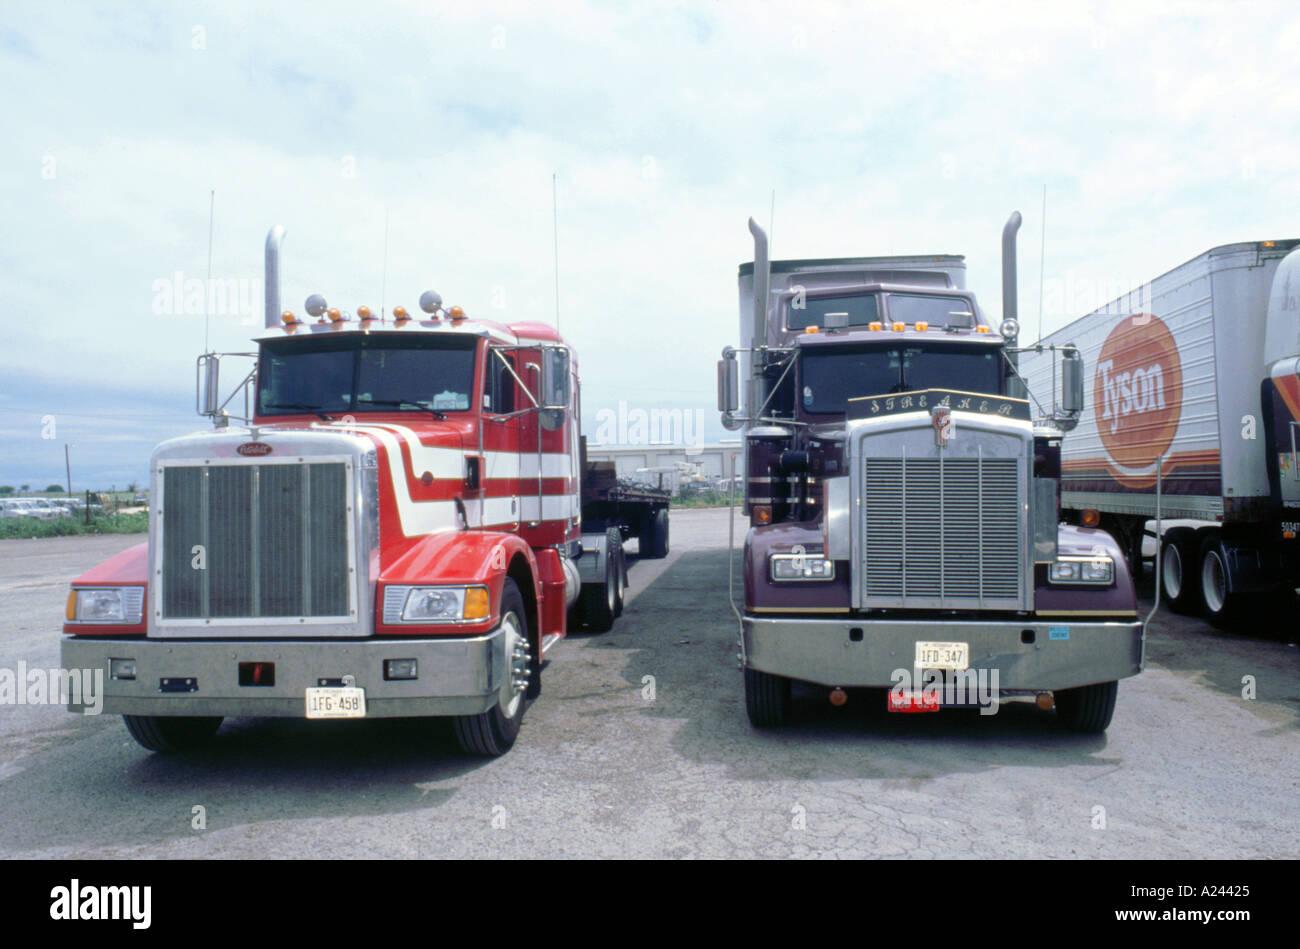 peterbilt american truck stockfotos peterbilt american. Black Bedroom Furniture Sets. Home Design Ideas